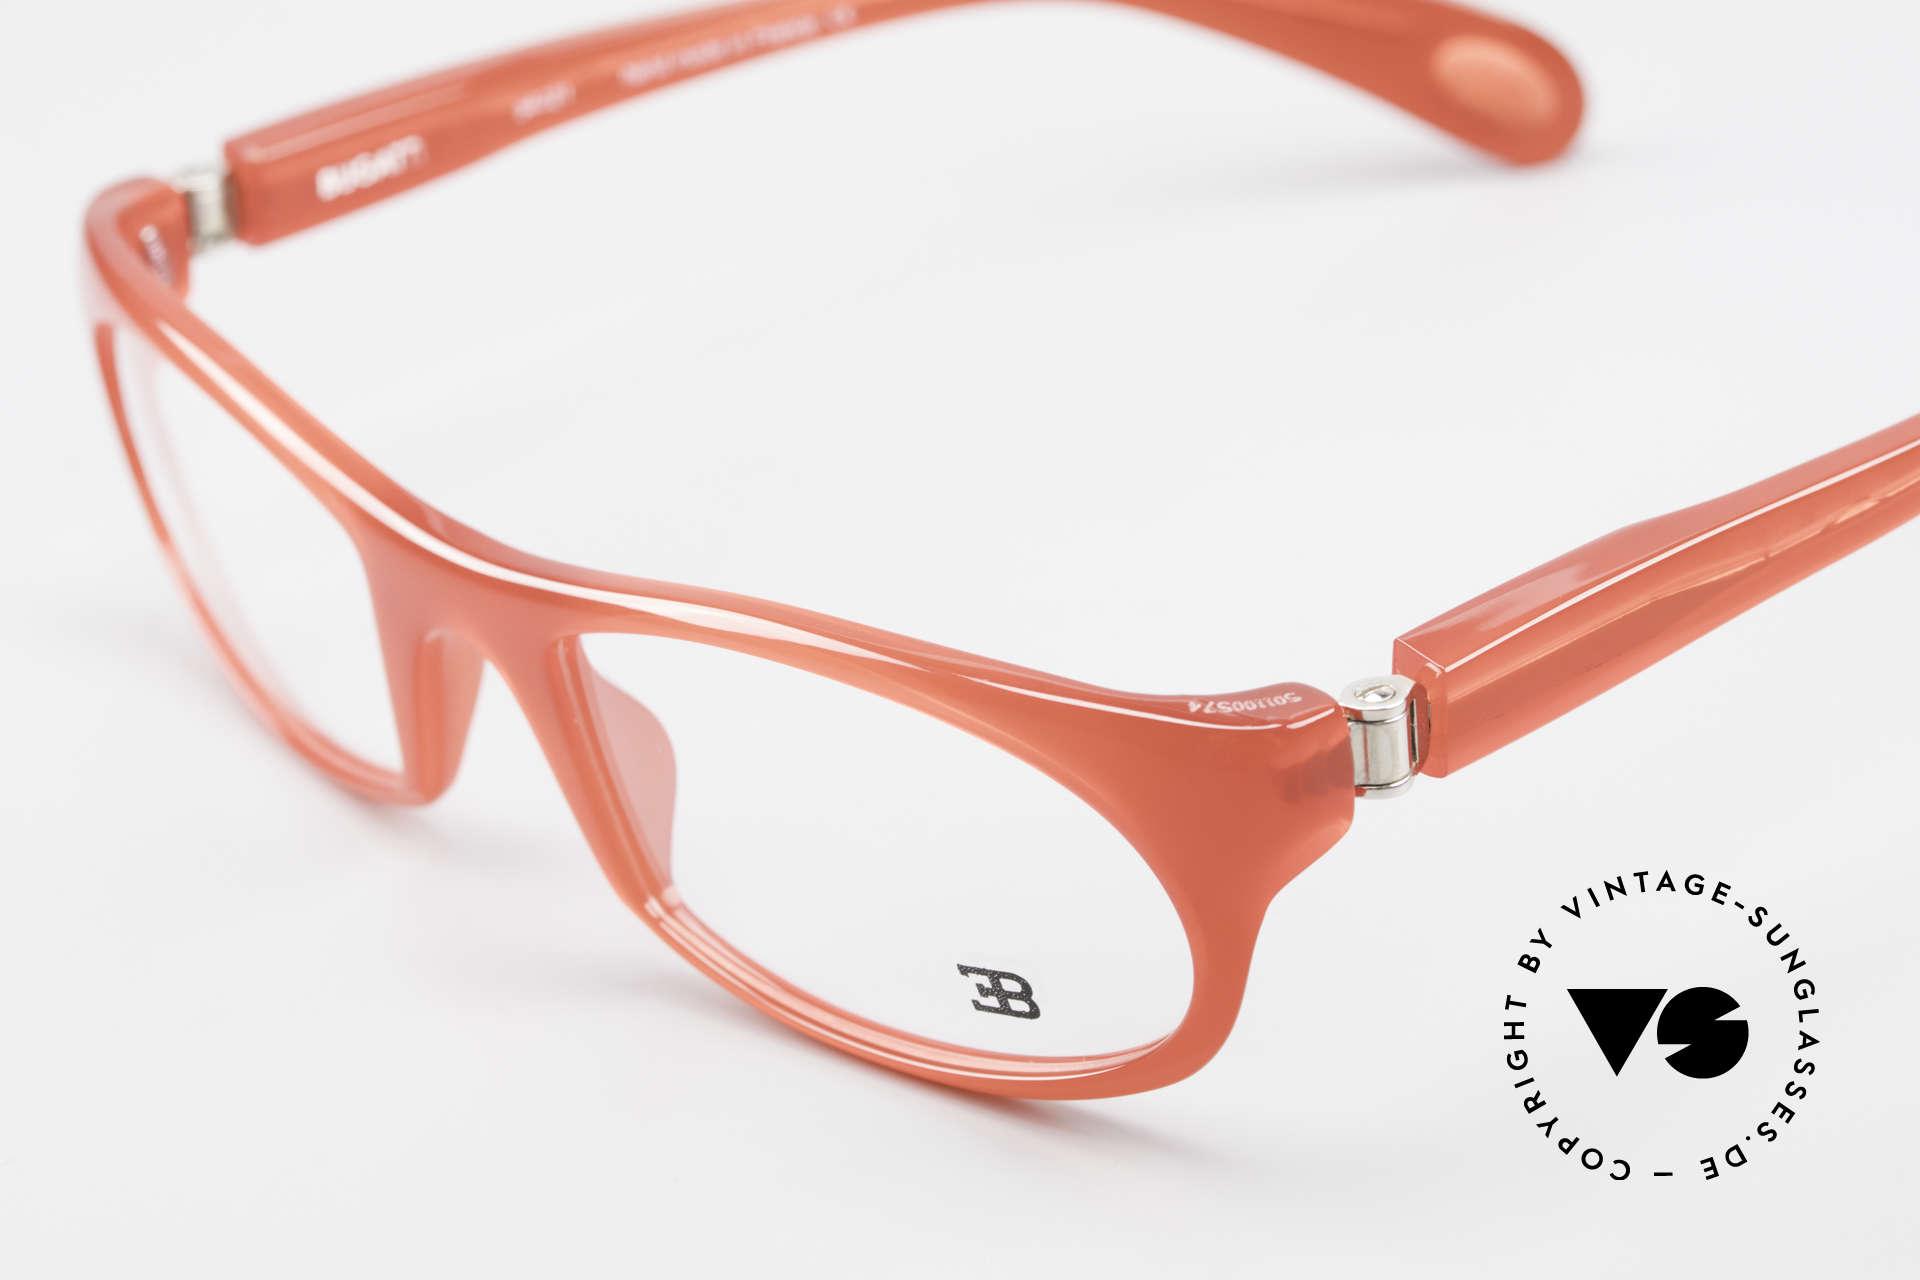 Bugatti 326 Odotype Rare Designer Eyeglass-Frame, very special lens construction; TOP comfort, Made for Men and Women